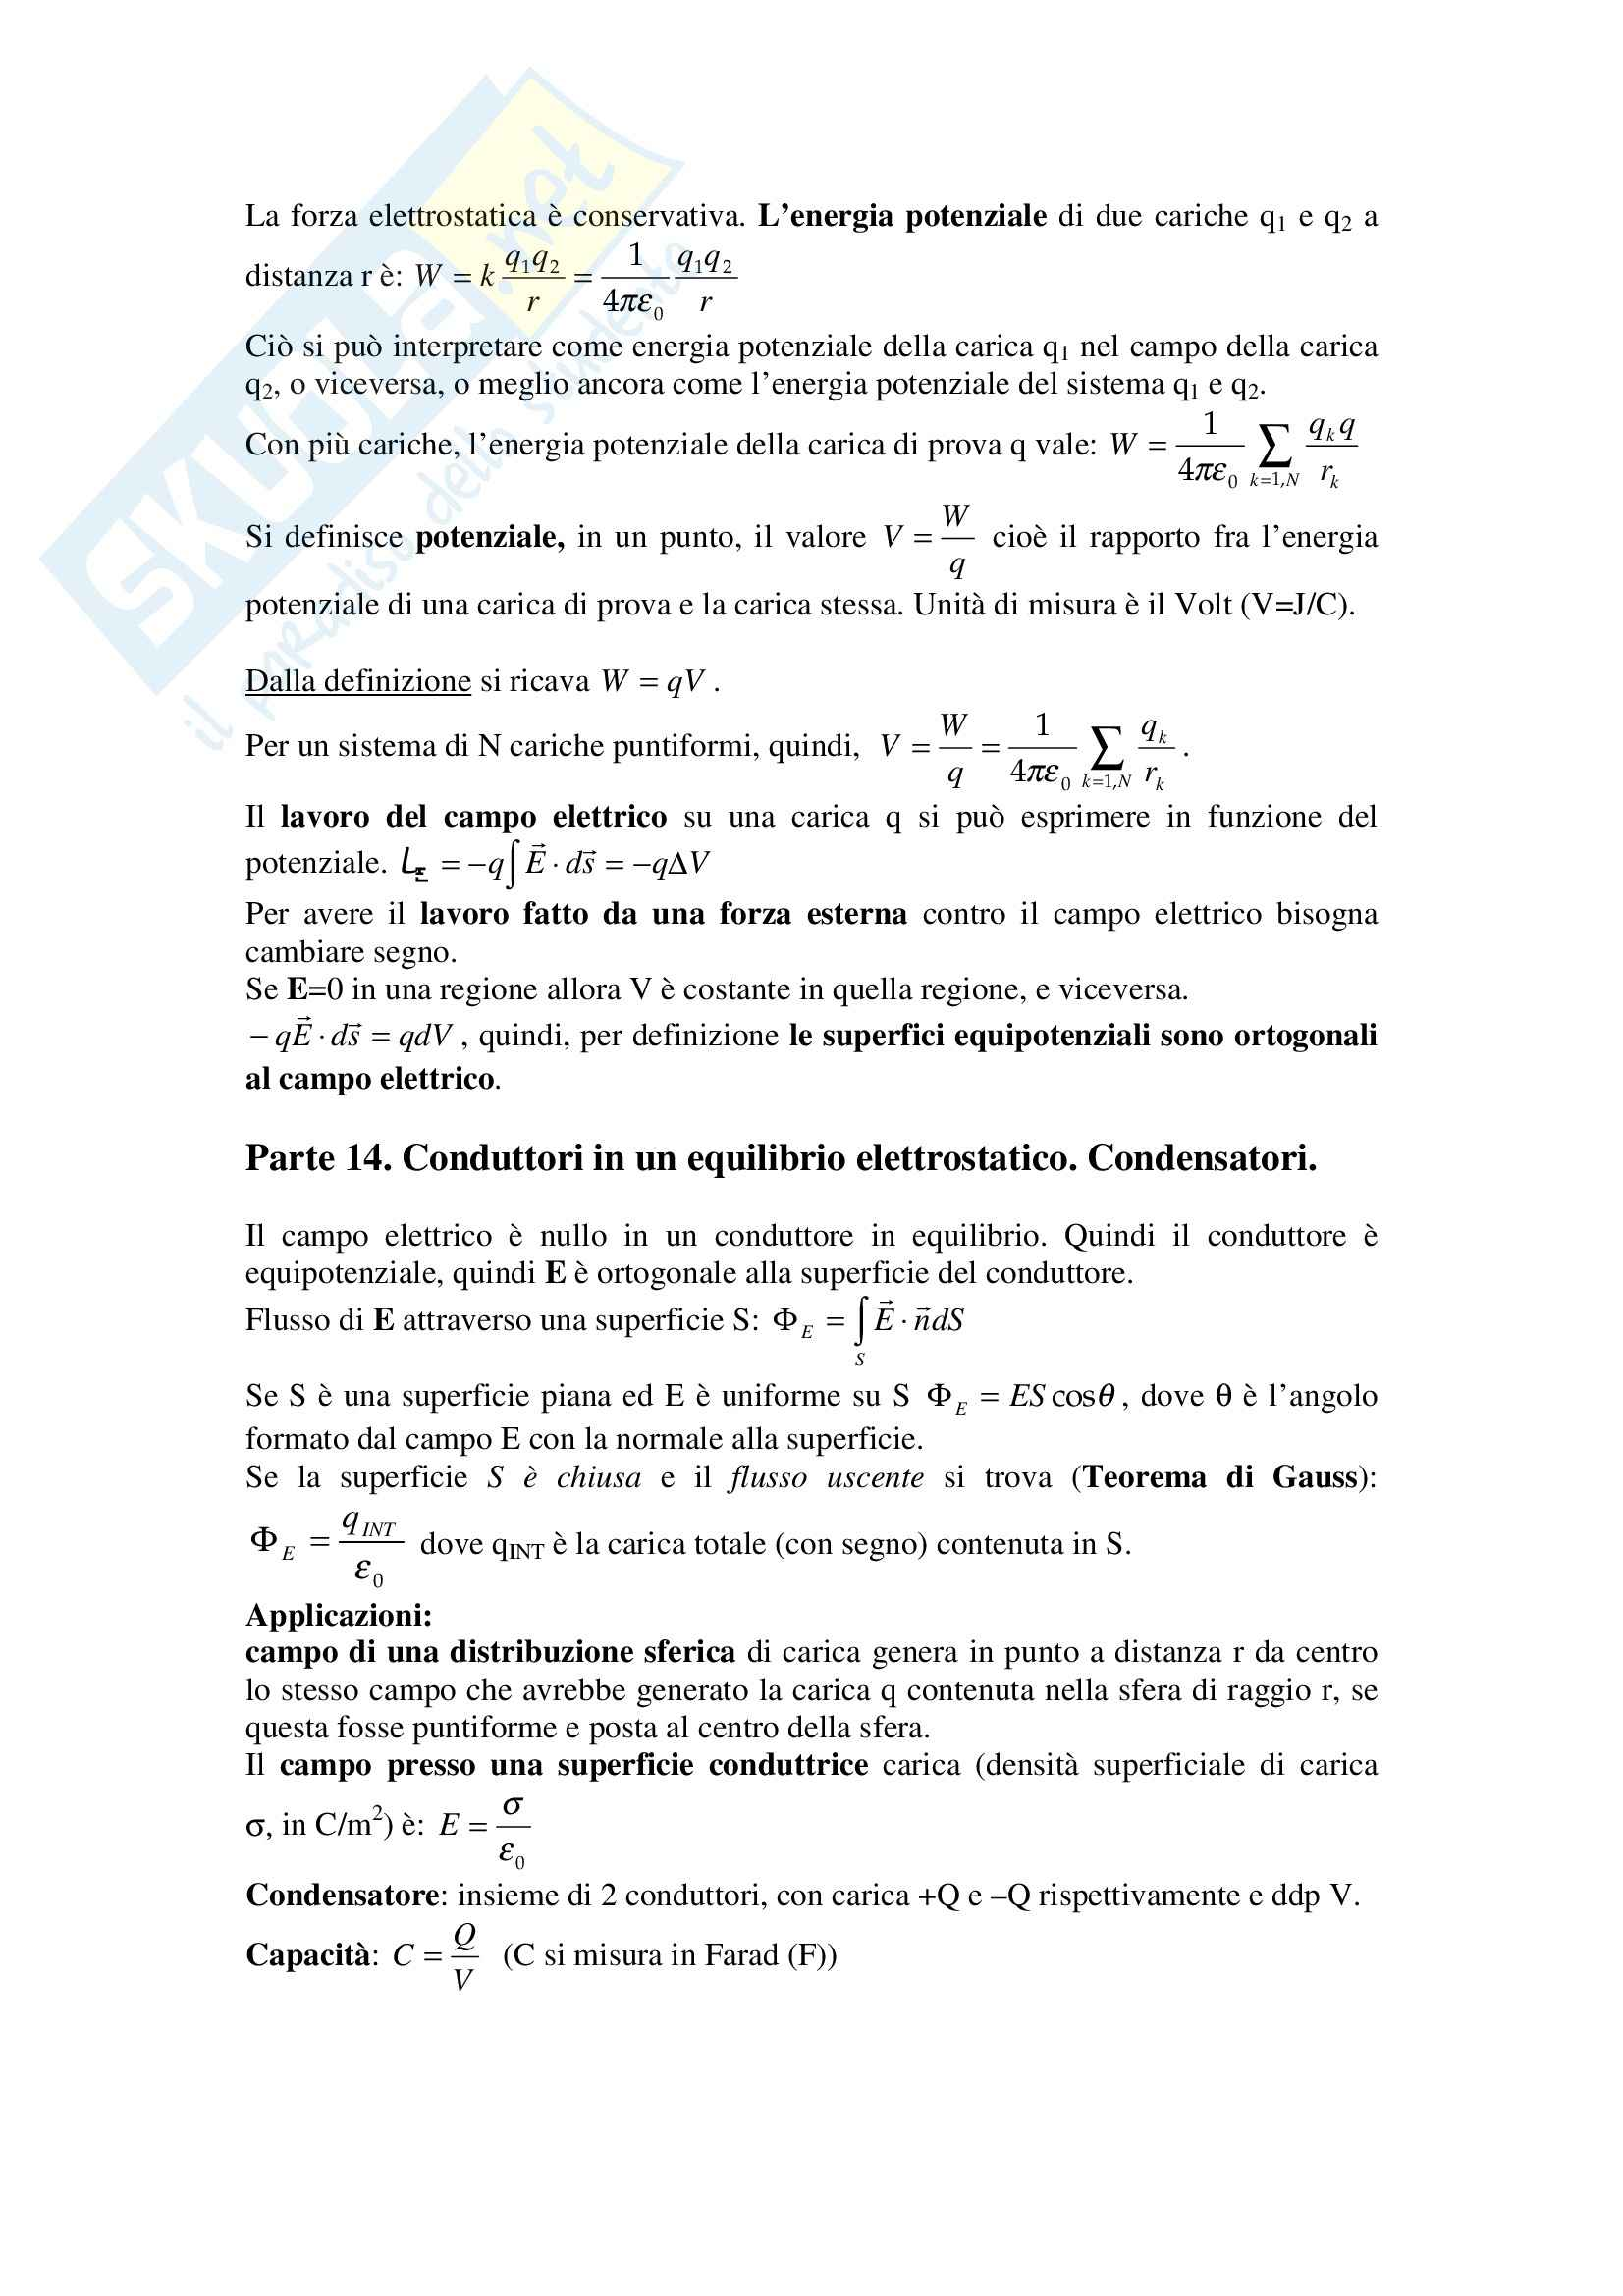 Fisica statistica ed informatica – Formulario Pag. 11